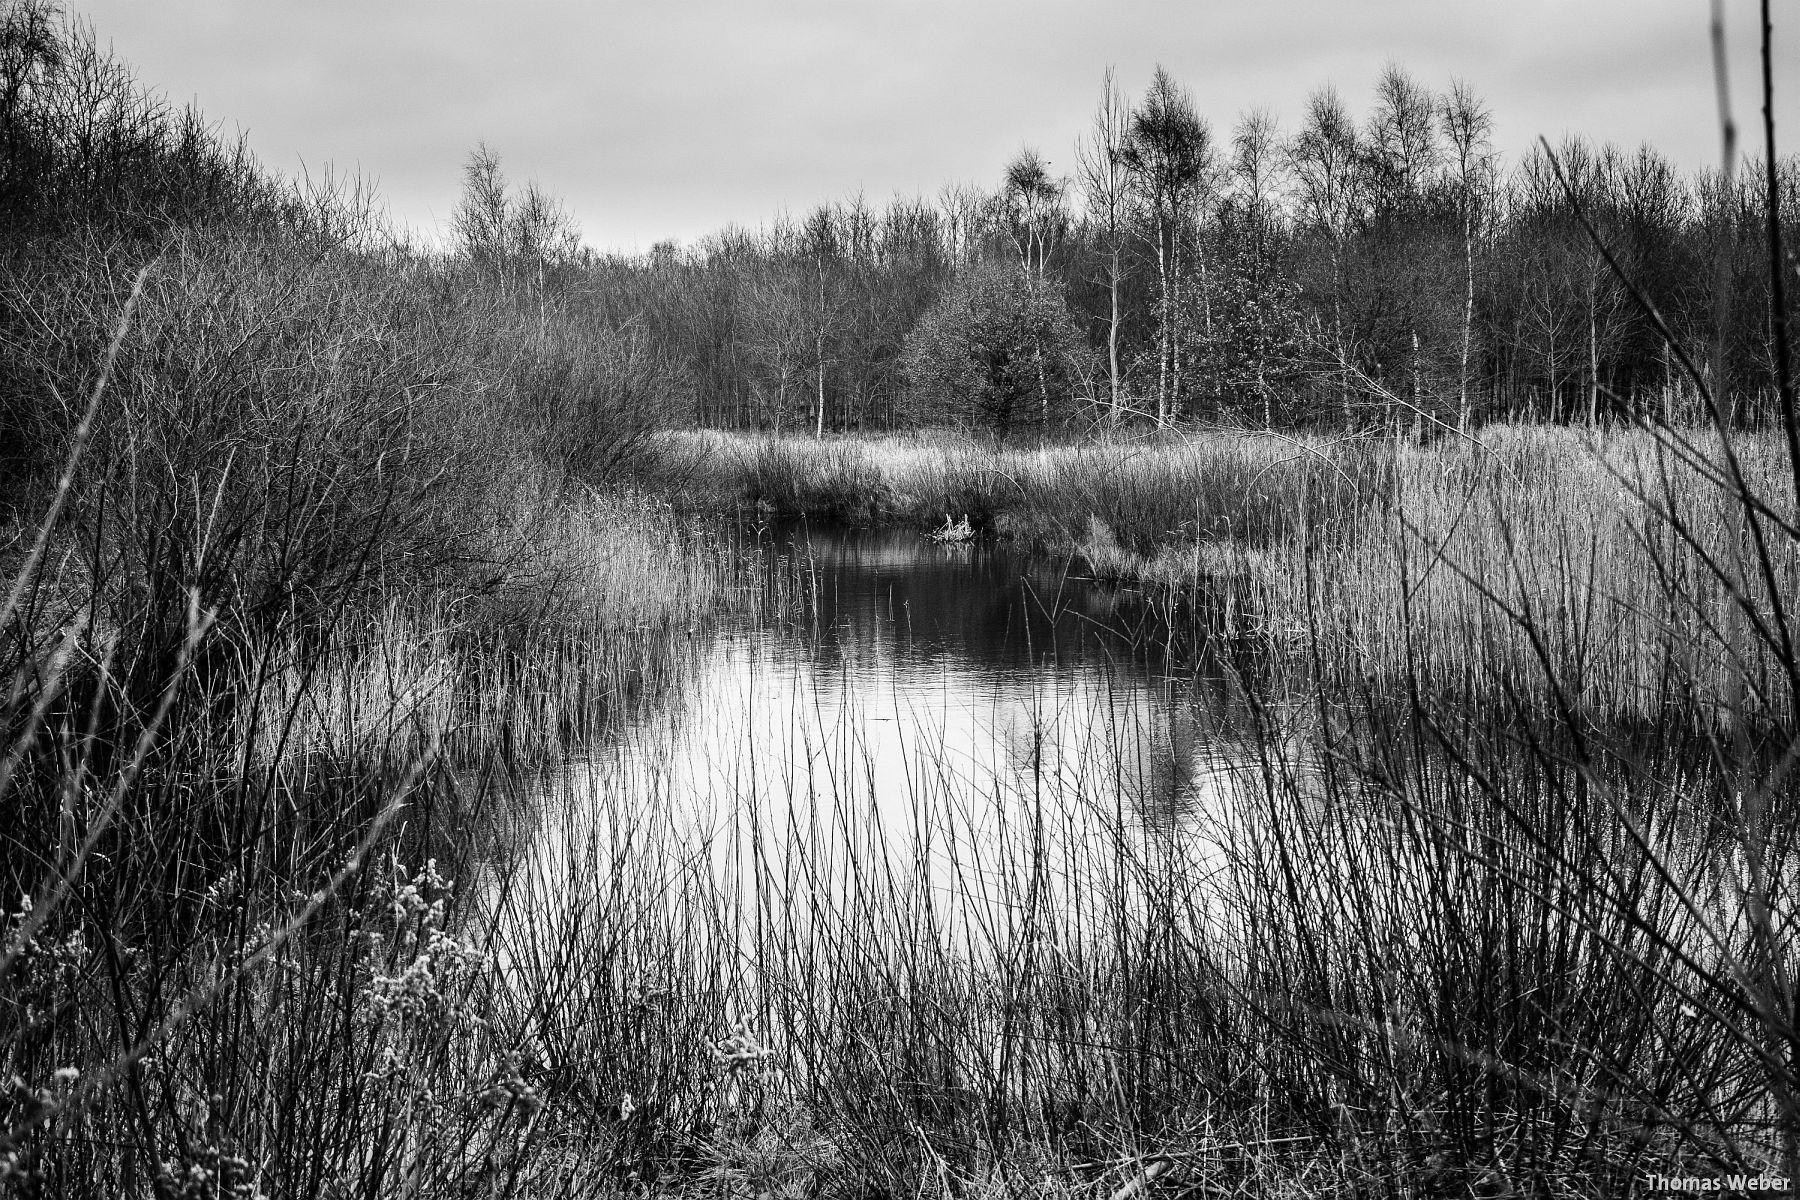 Fotograf Thomas Weber aus Oldenburg: Herbstlandschaft in Oldenburg